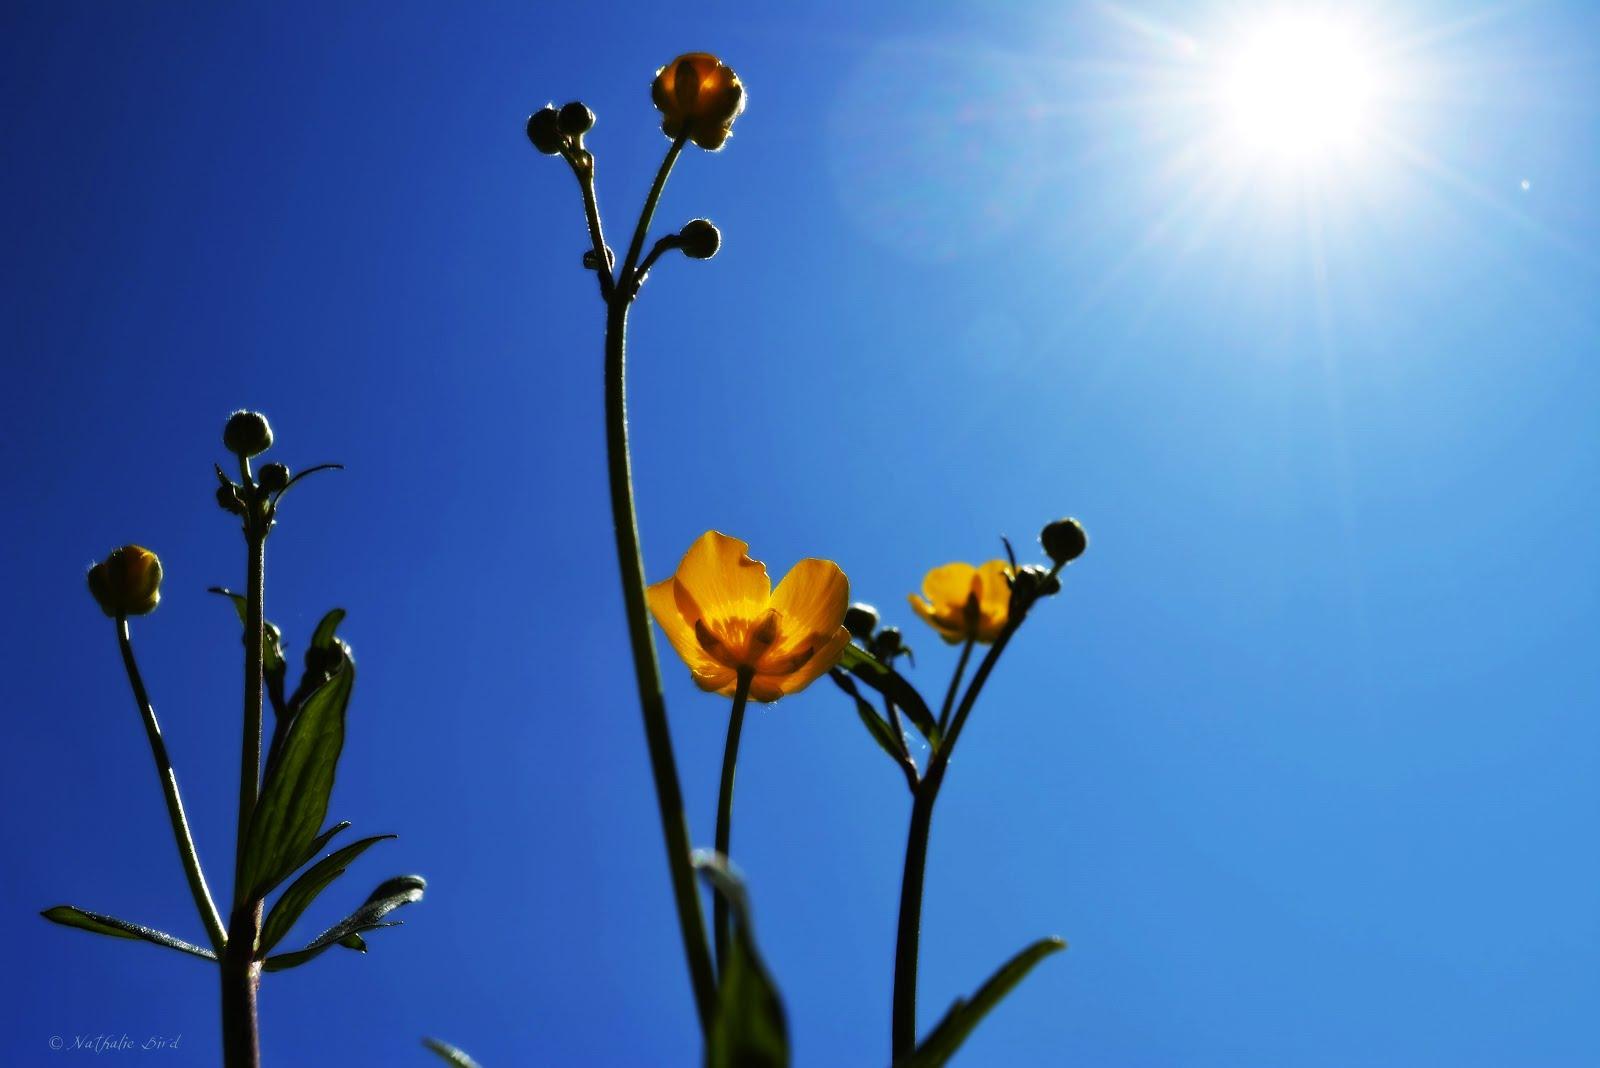 Sonnen-Blume